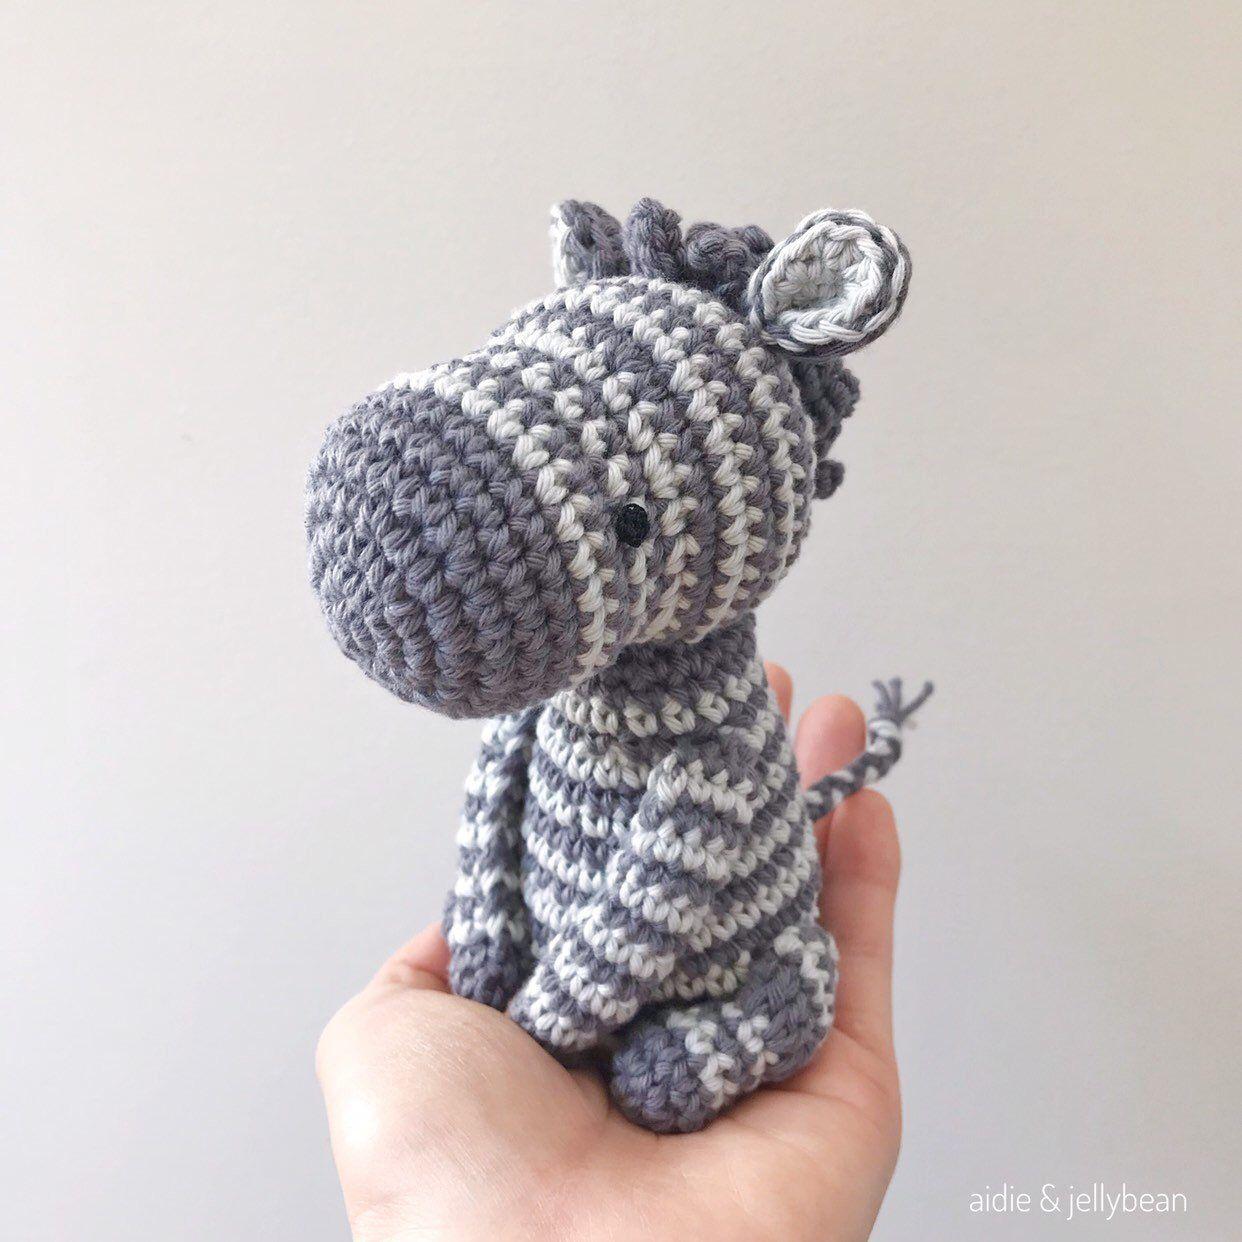 Crochet Stuffed Zebra Amigurumi Toy | 1242x1242